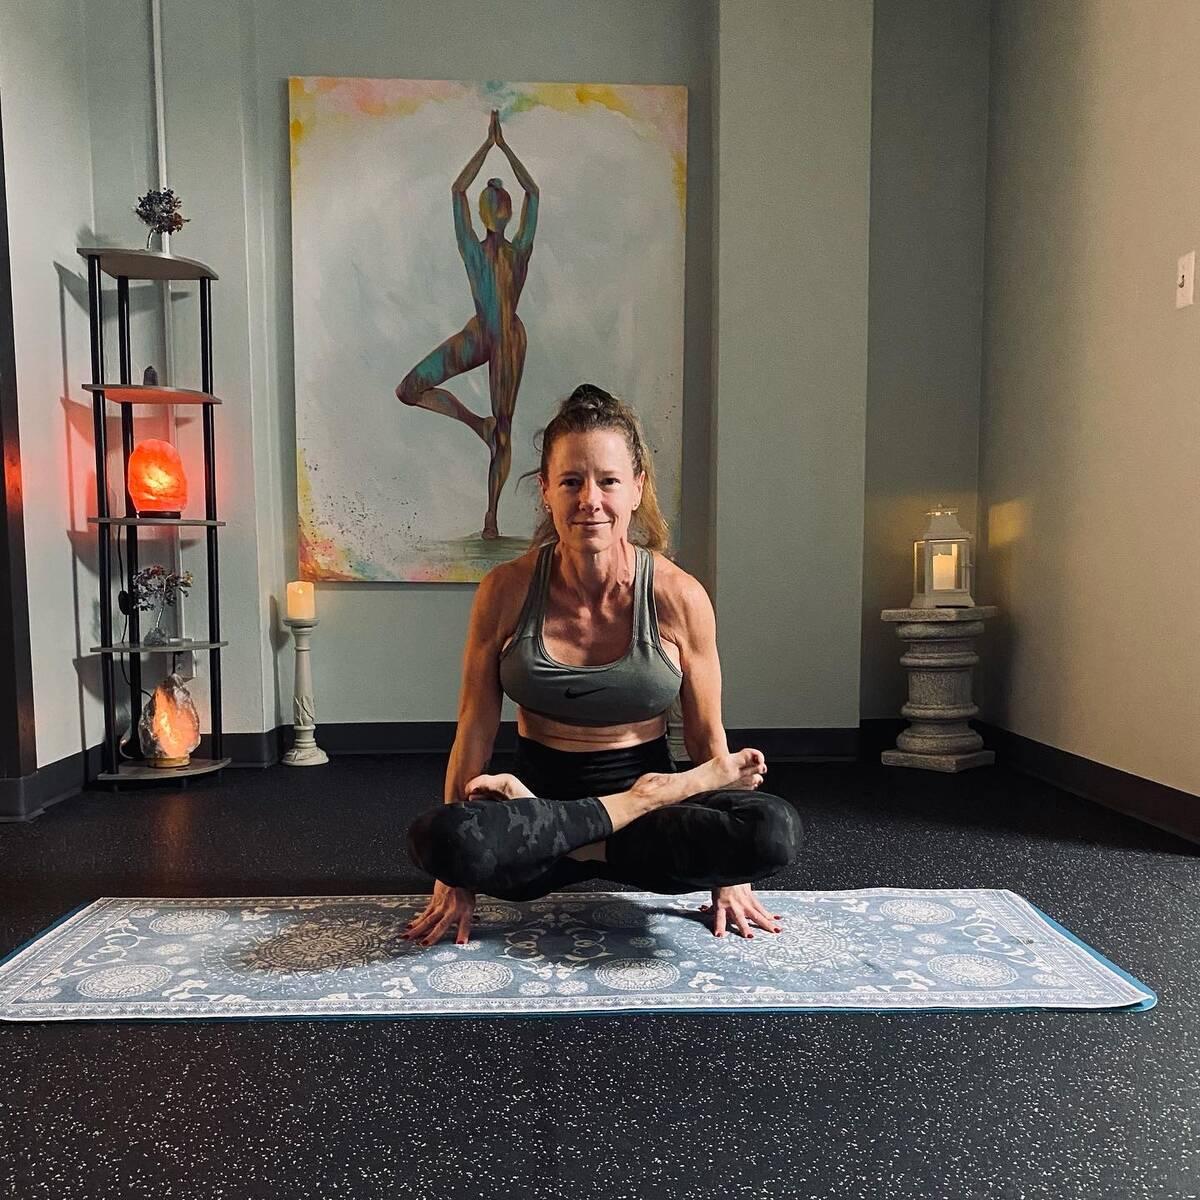 Hot 26 PLUS 🔥2️⃣6️⃣➕ - Lotus Room Yoga